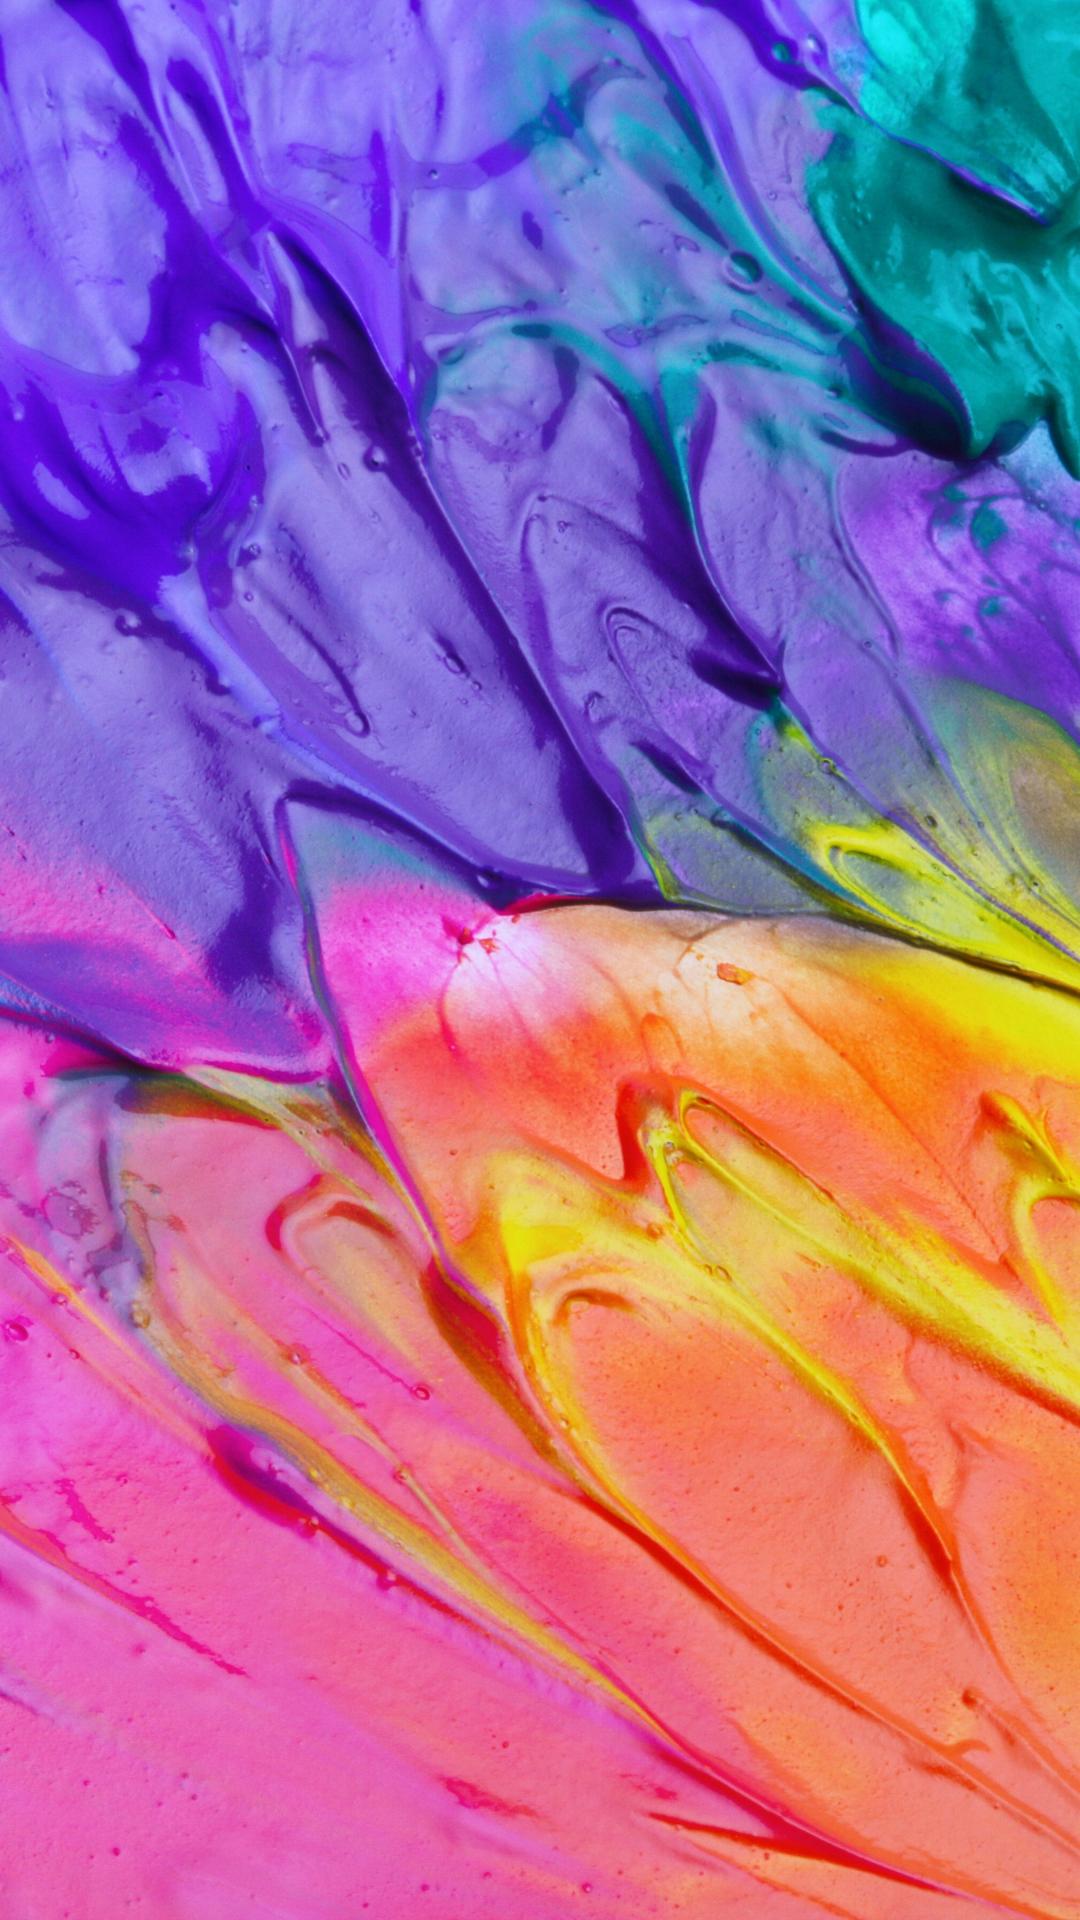 paint stains spots bright Paint